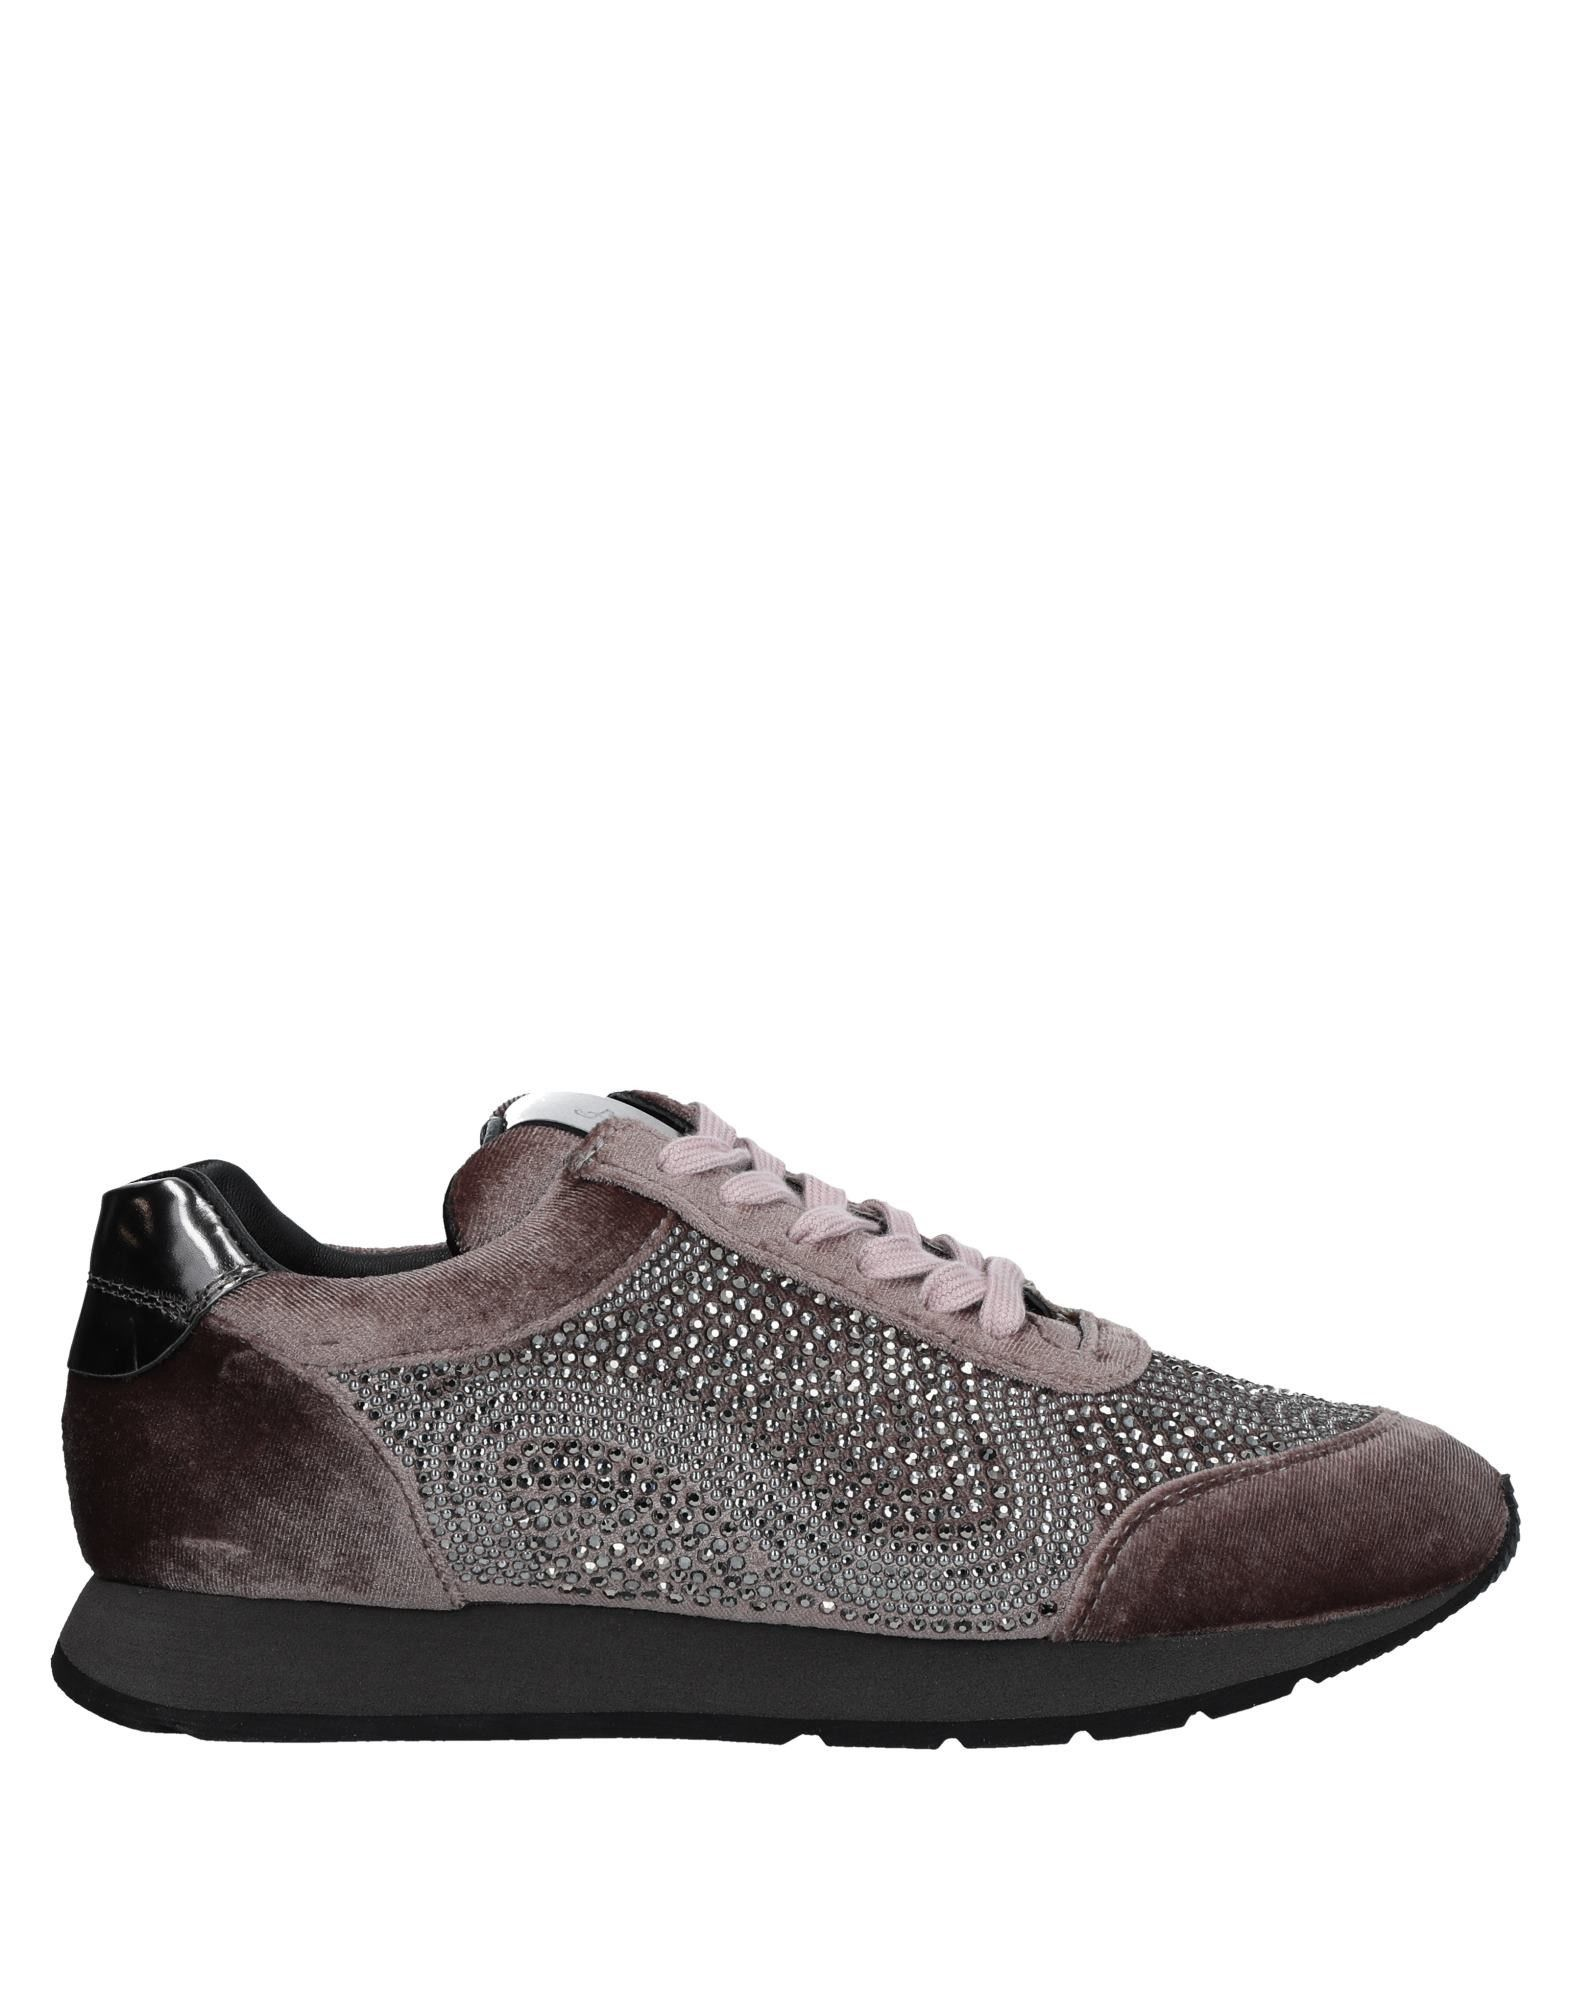 Alma En Pena. Sneakers Damen  11525834WK Gute Qualität beliebte Schuhe